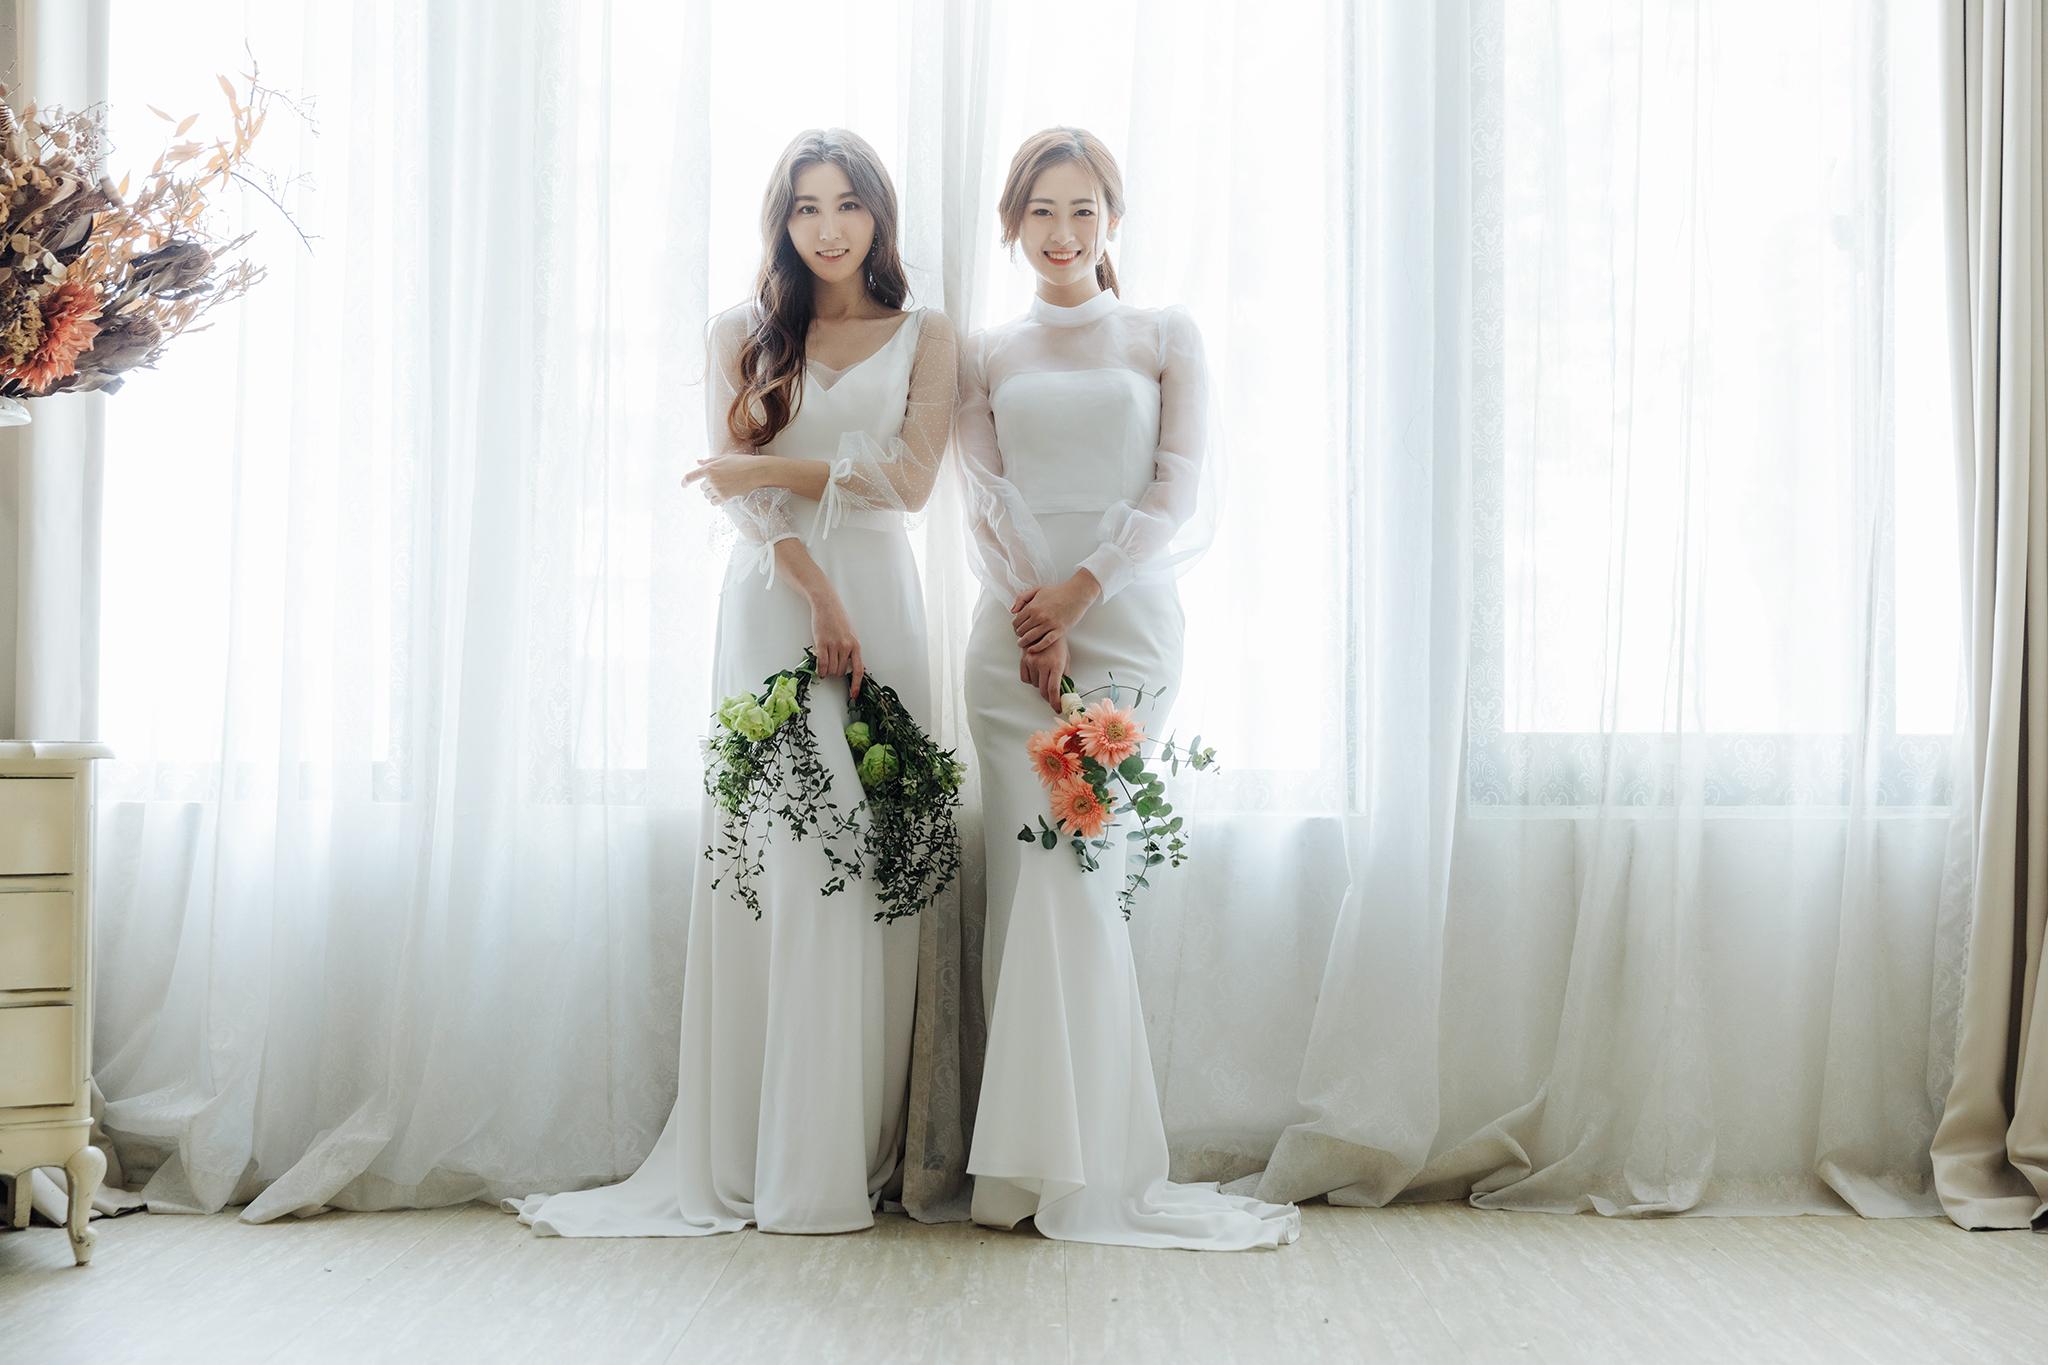 49929258036 8c8098a36a o - 【閨蜜婚紗】+Jessy & Tiffany+